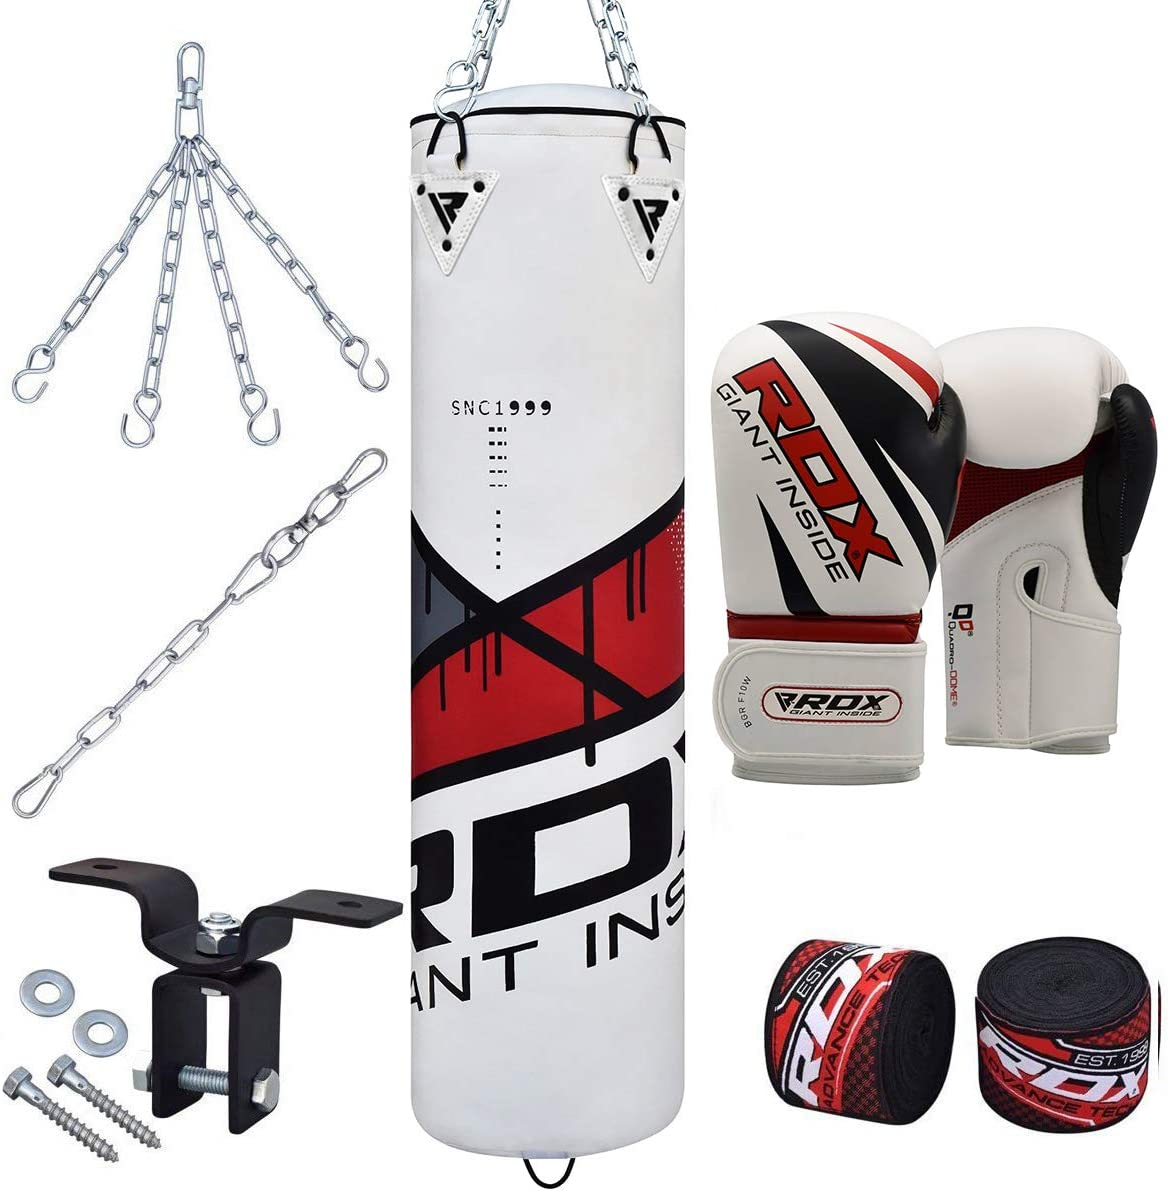 RDX 8PC Sacos De Boxeo MMA 4FT 5FT Relleno Saco Pesado Pared Kick Boxing Guantes Muay Thai Gancho del Techo